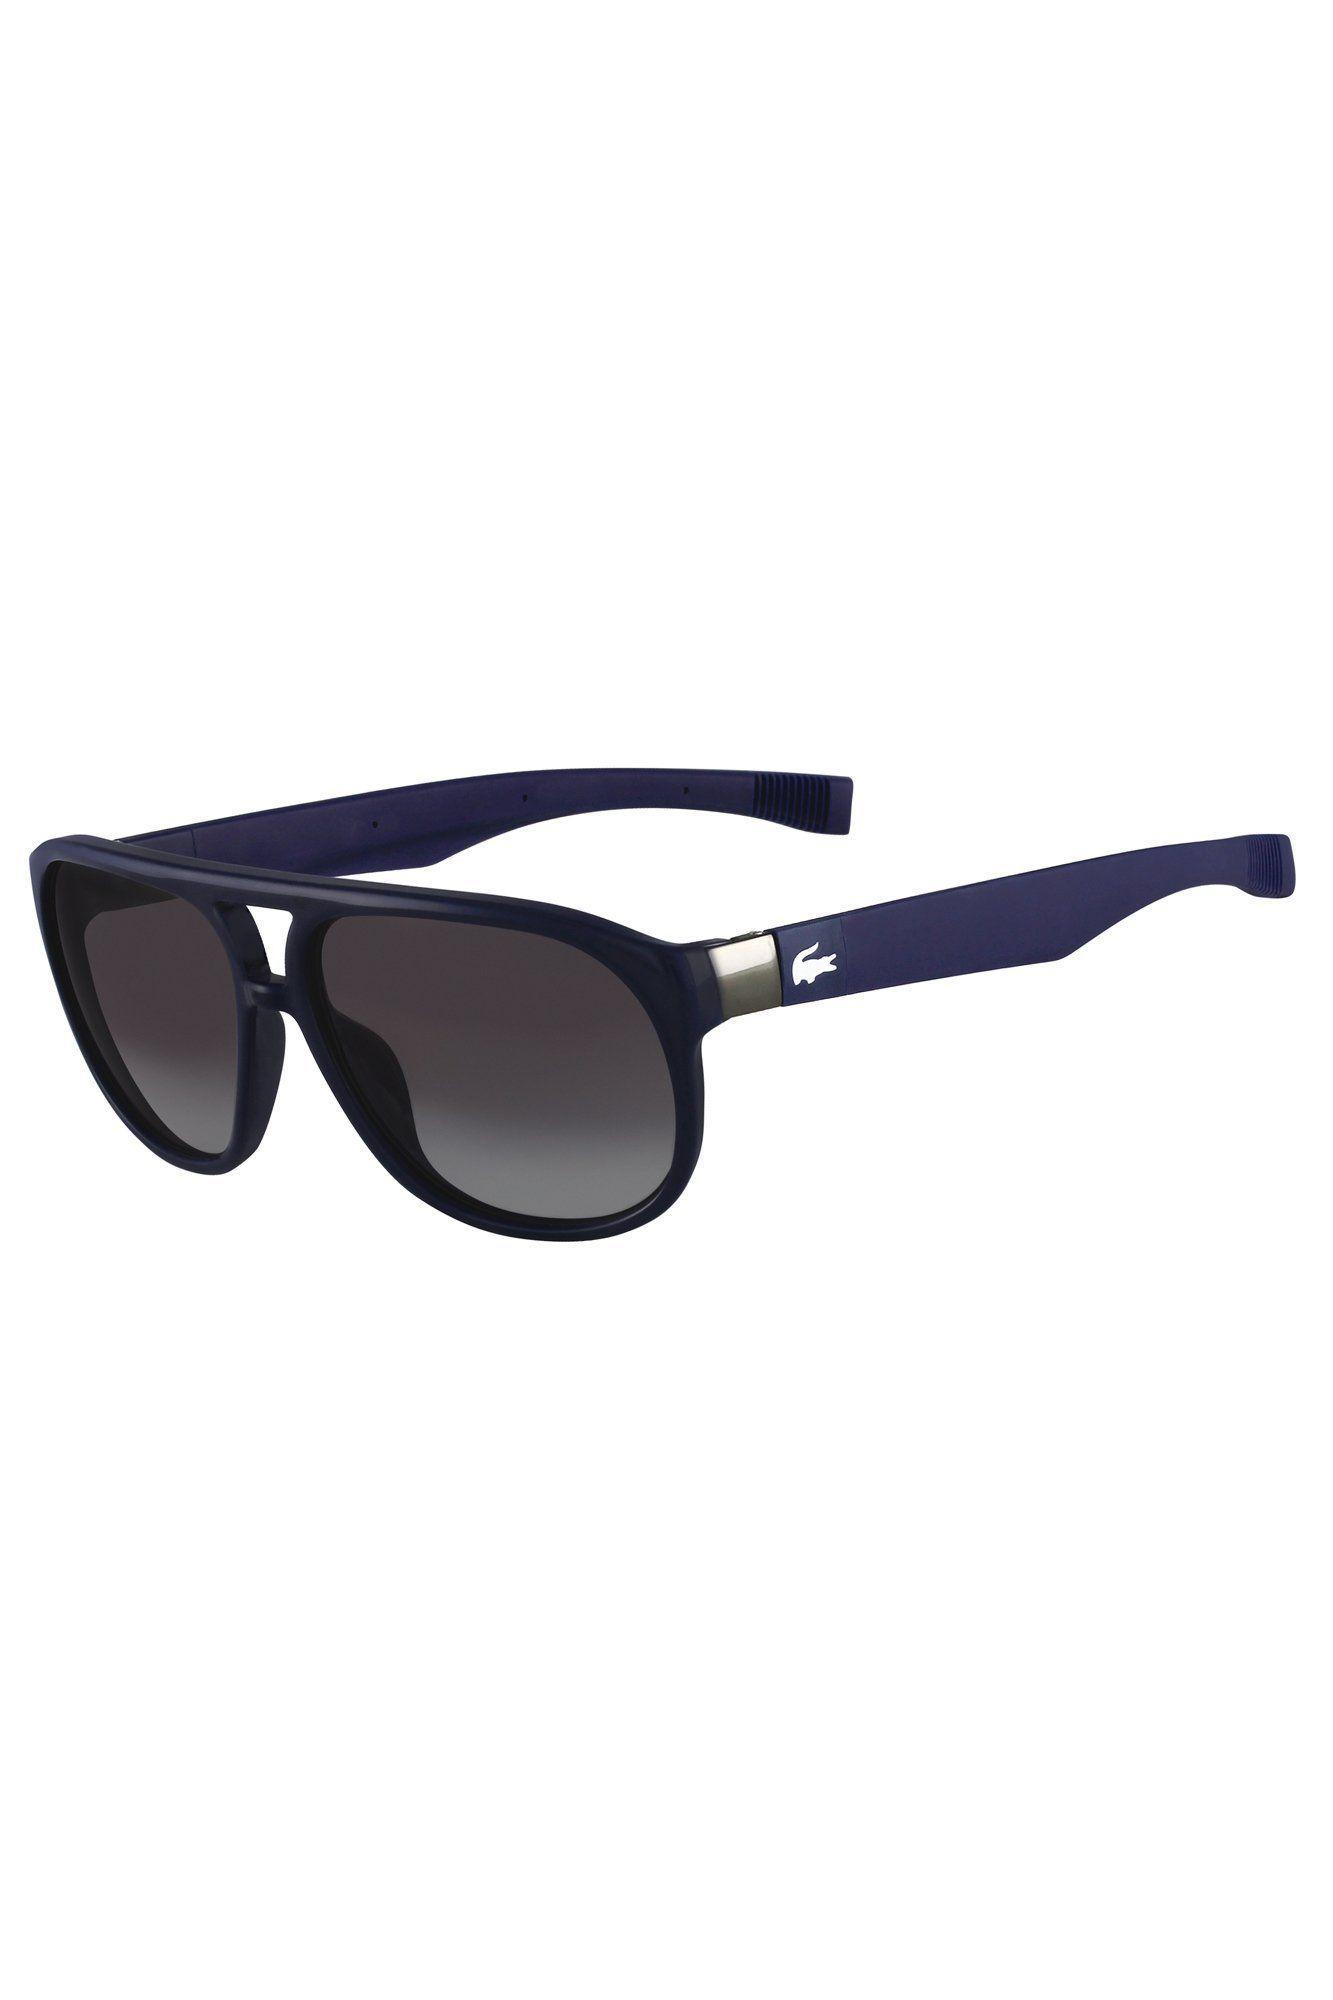 98c1a52a677f5  Lacoste Men s L663S  eyewear  Mensaccessories Tipos De Lentes, Tendencias  Ropa, Como